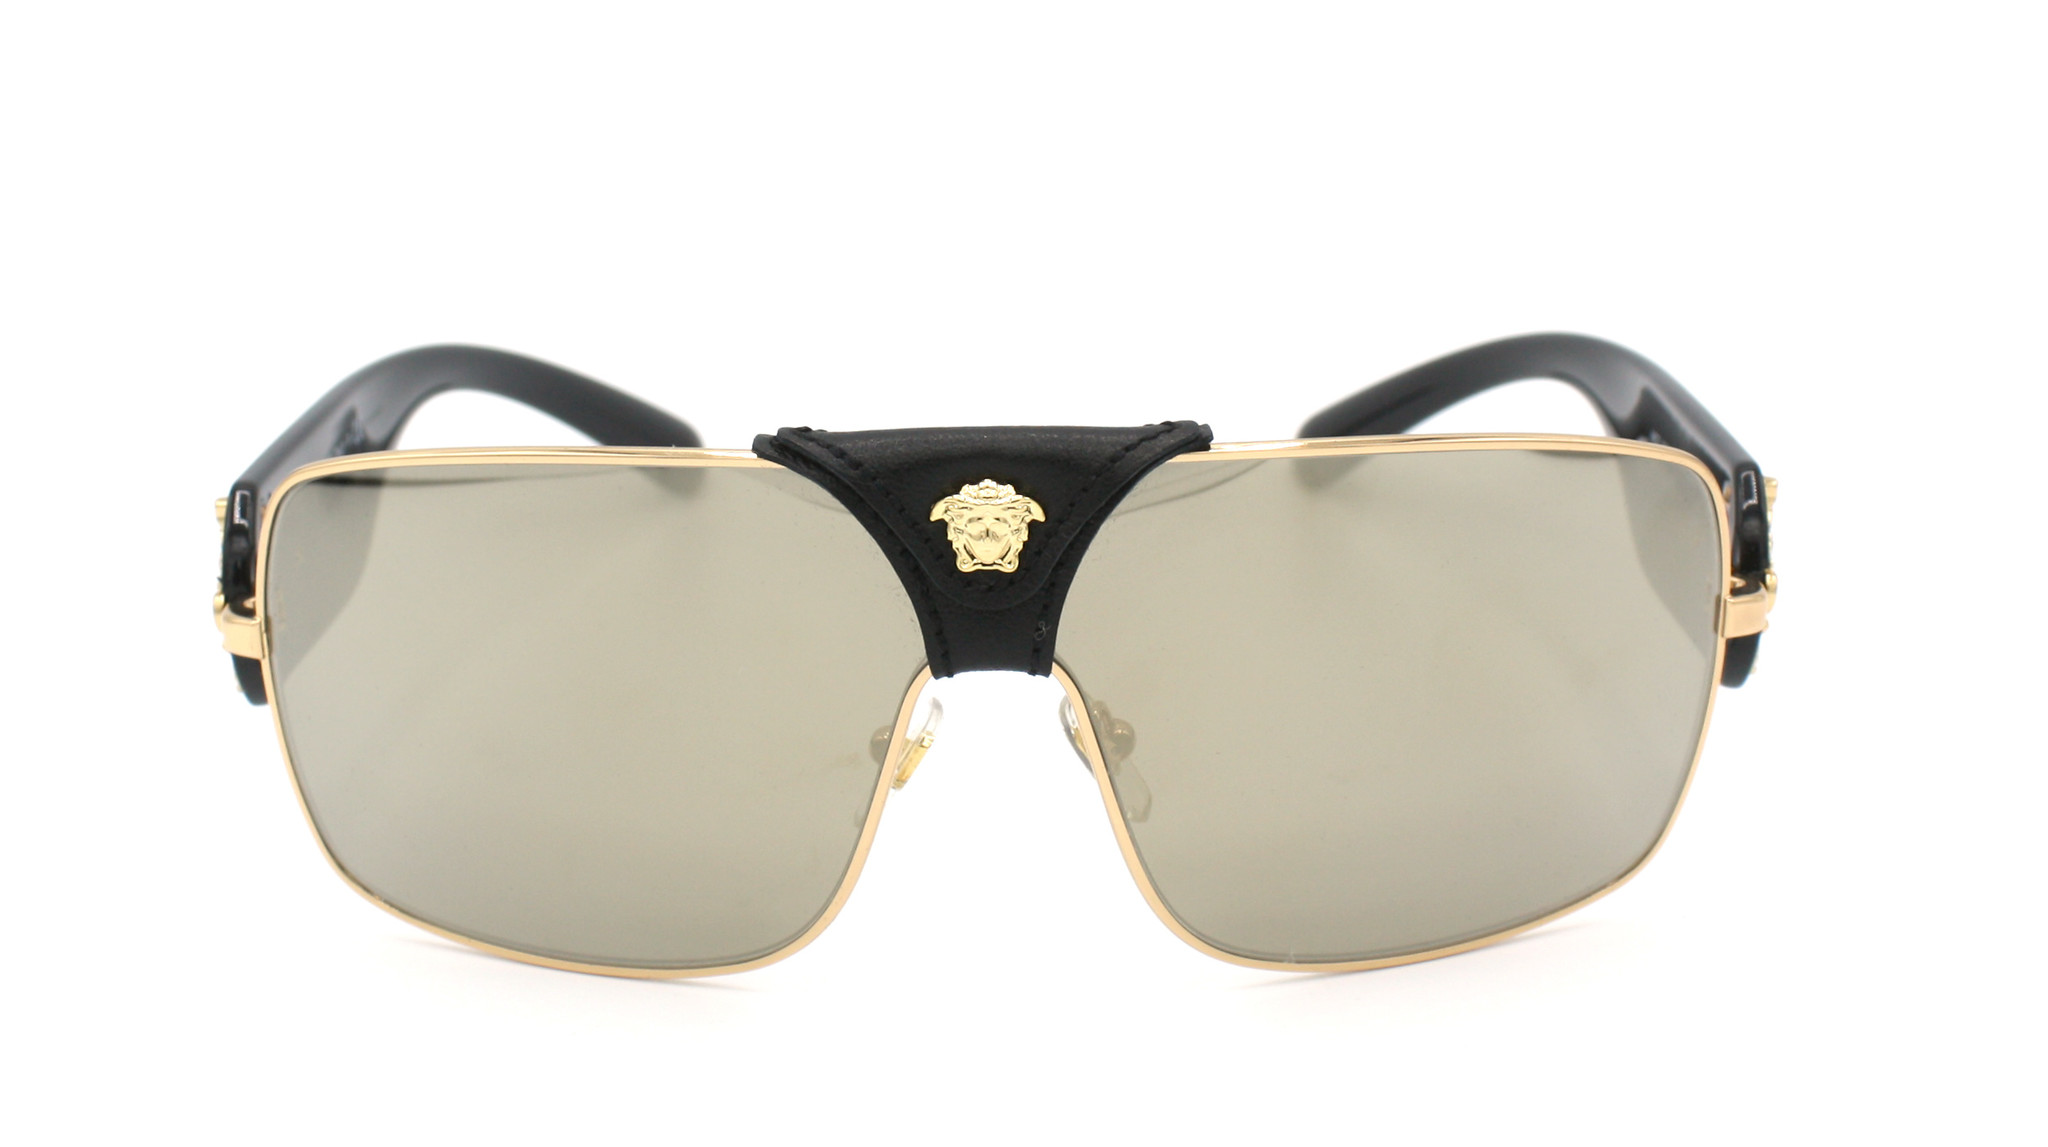 Versace - 2207-Q - 1002/5-1